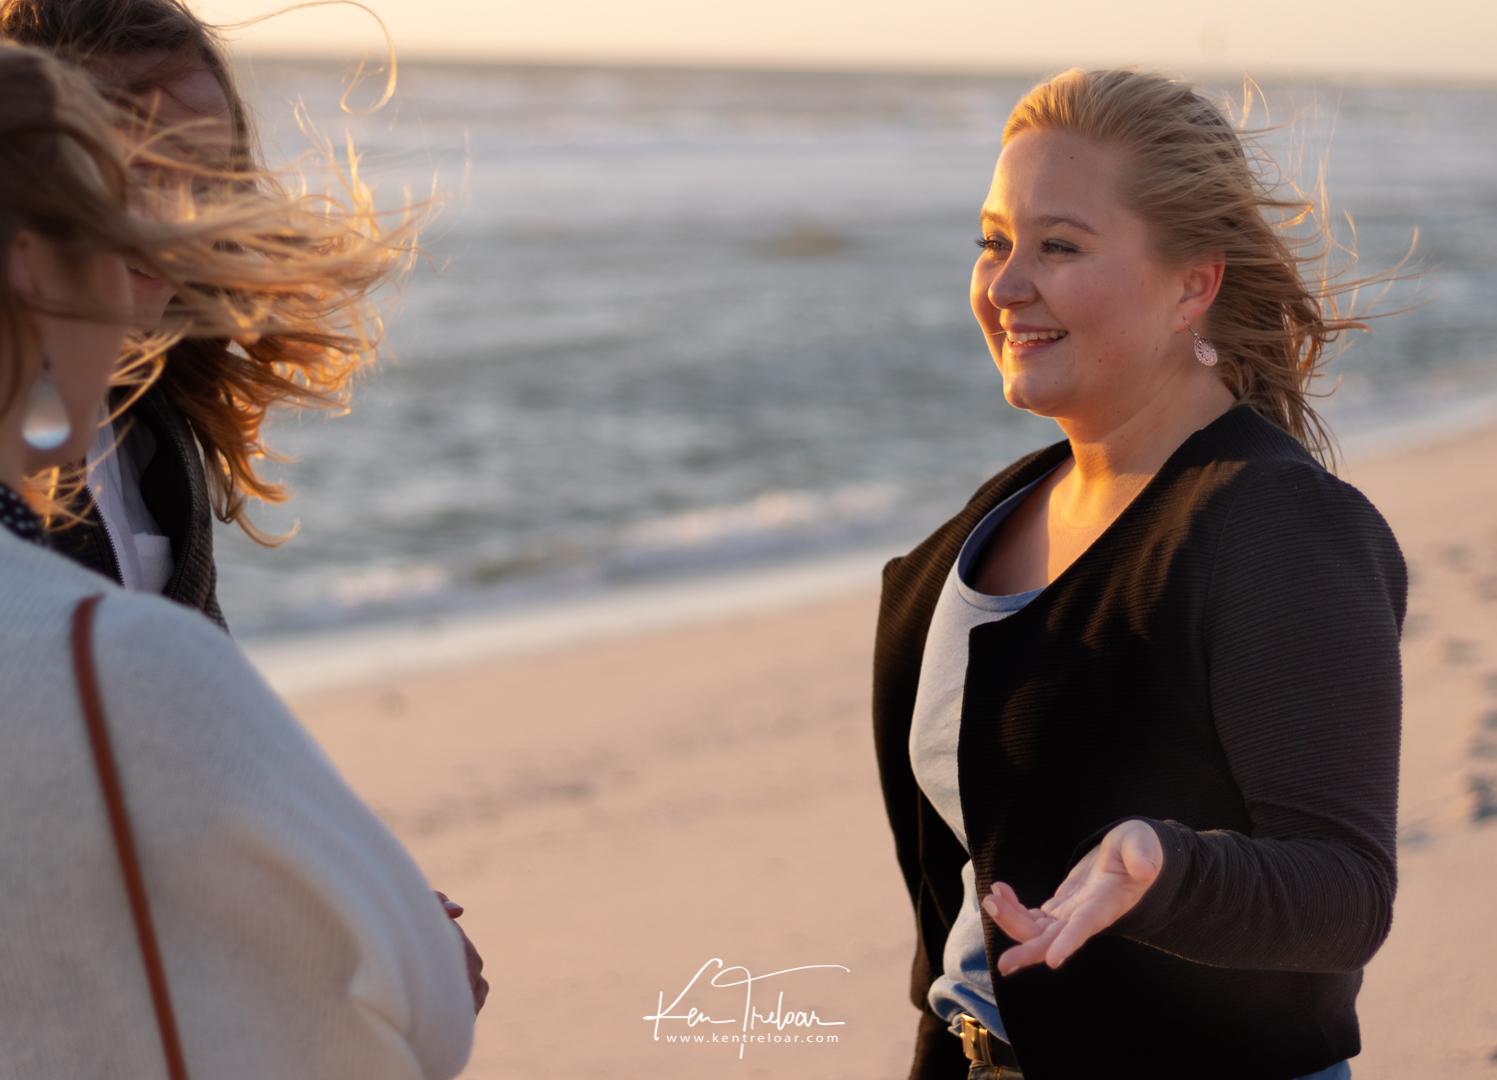 Best Friends Portrait Photography Blouberg,  Cape Town - by Ken Treloar - all rights reserved-5.jpg